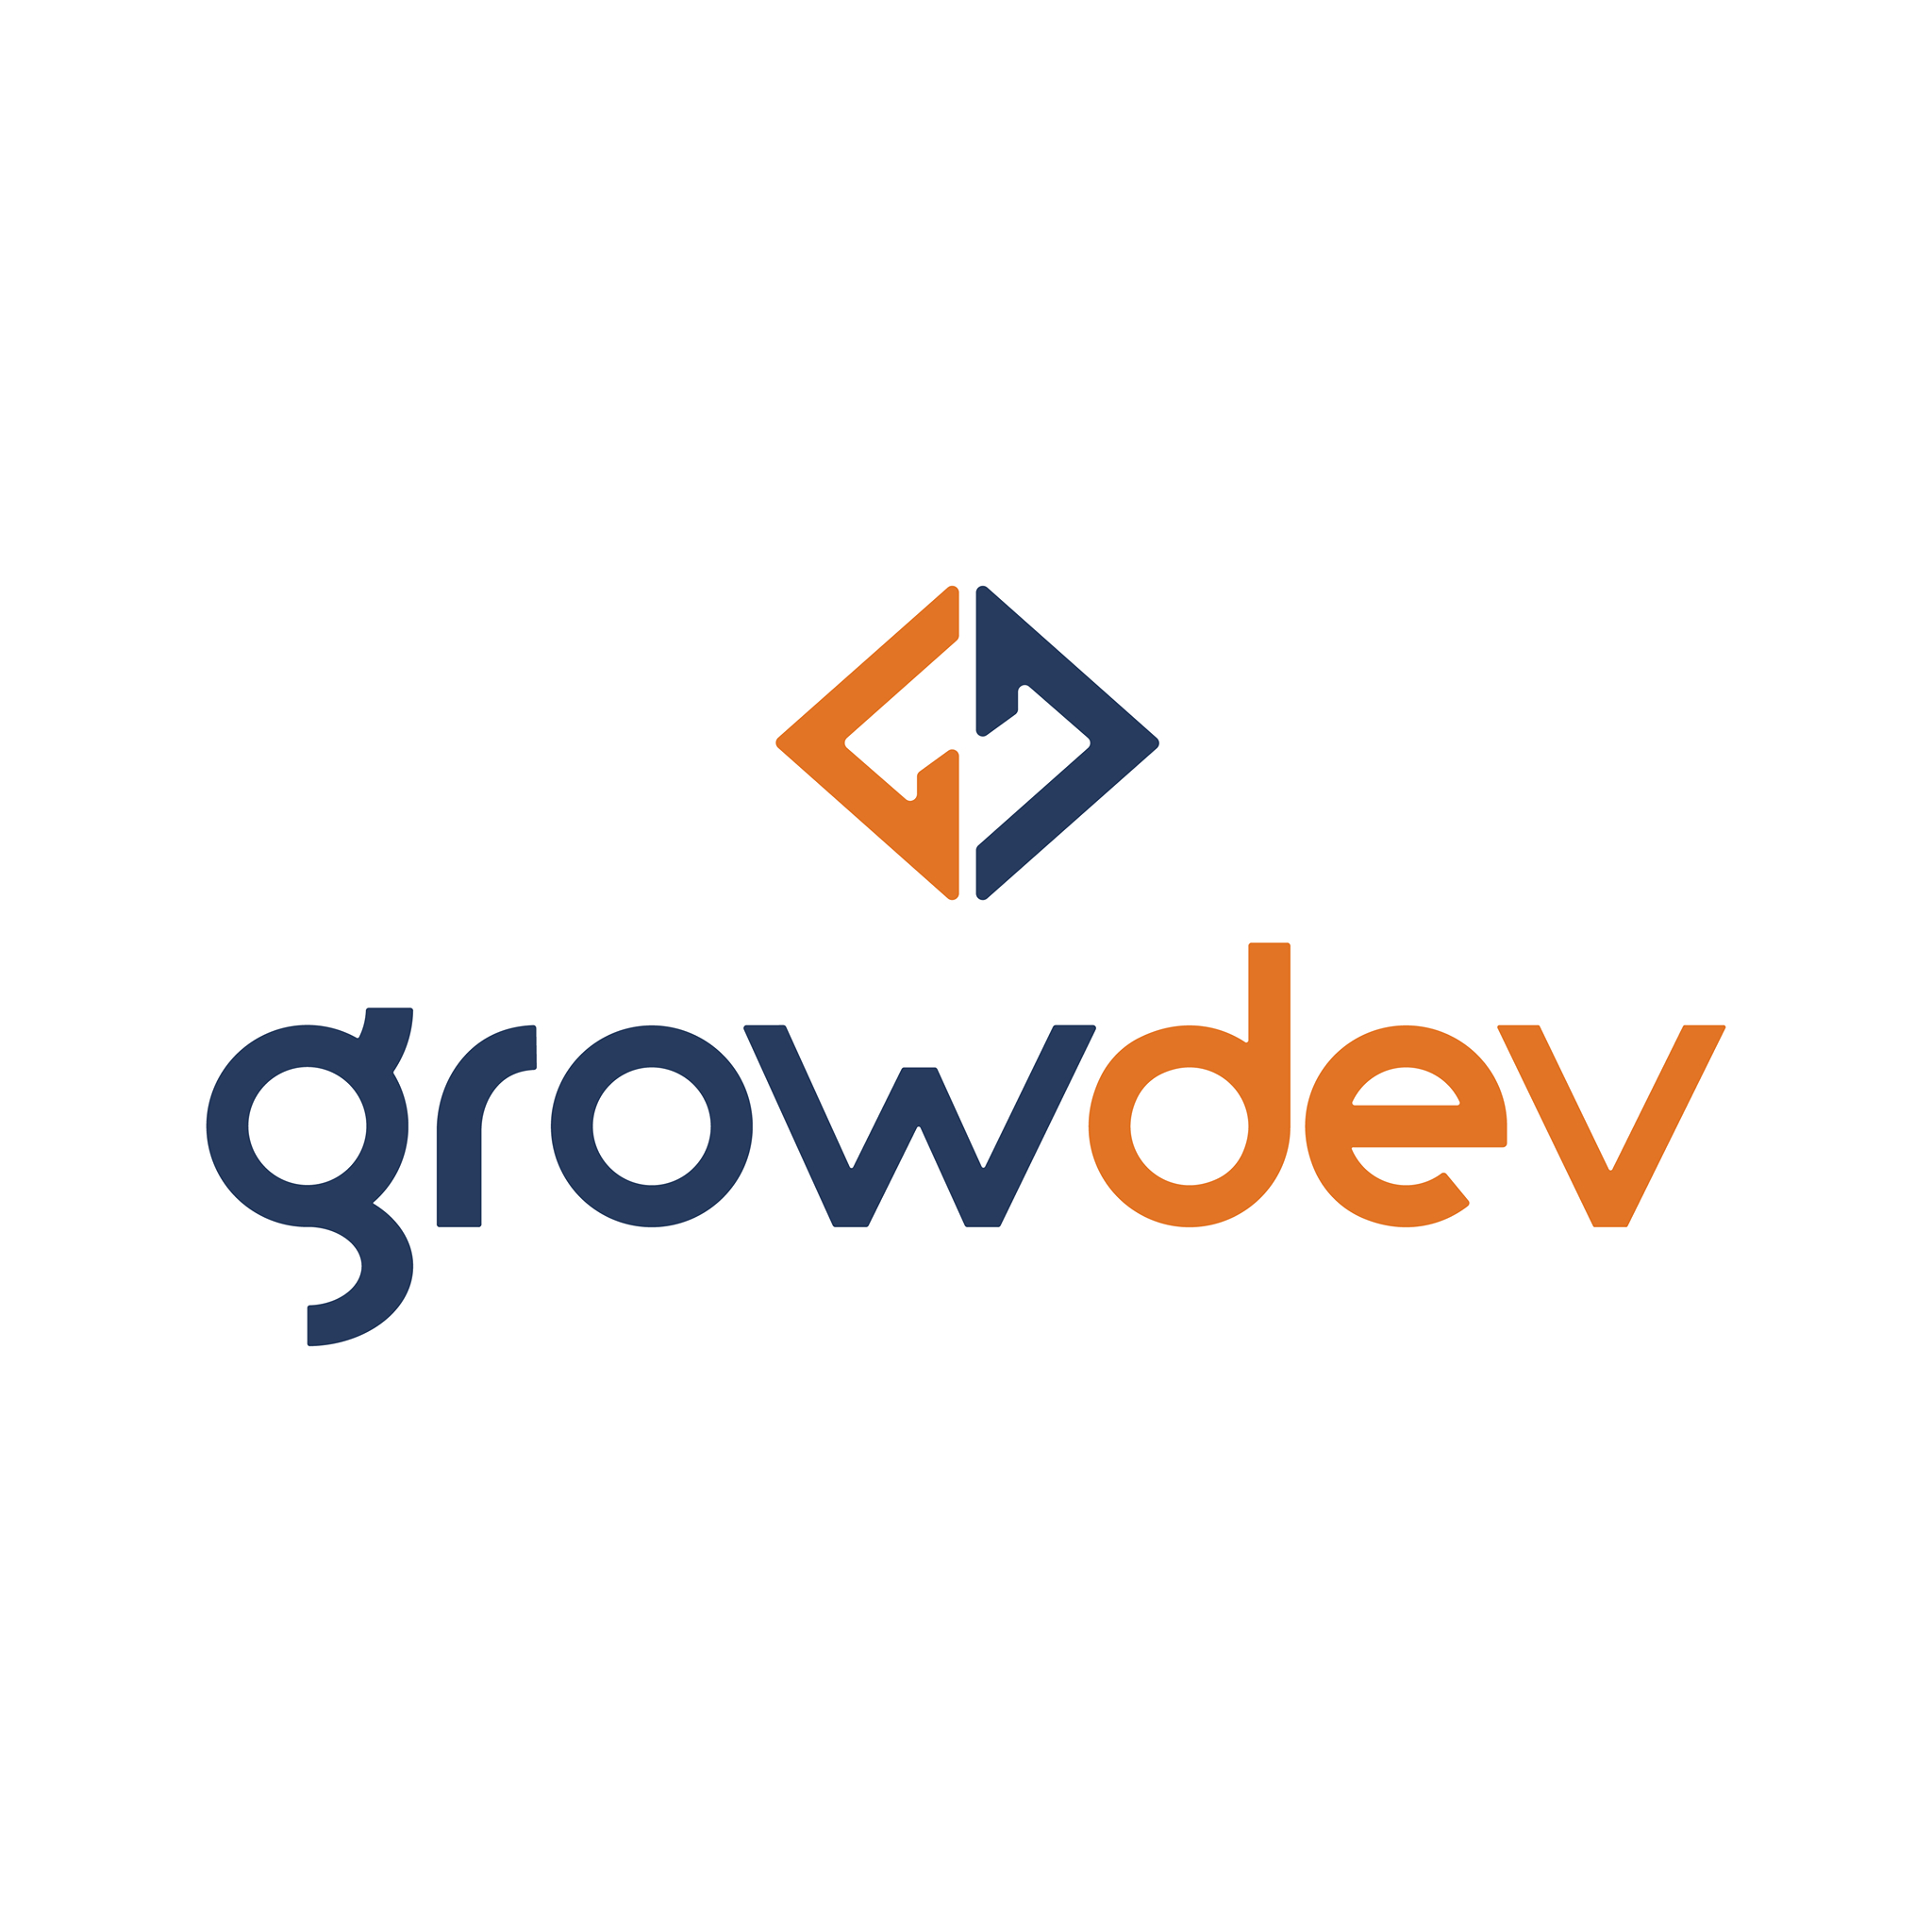 growdev